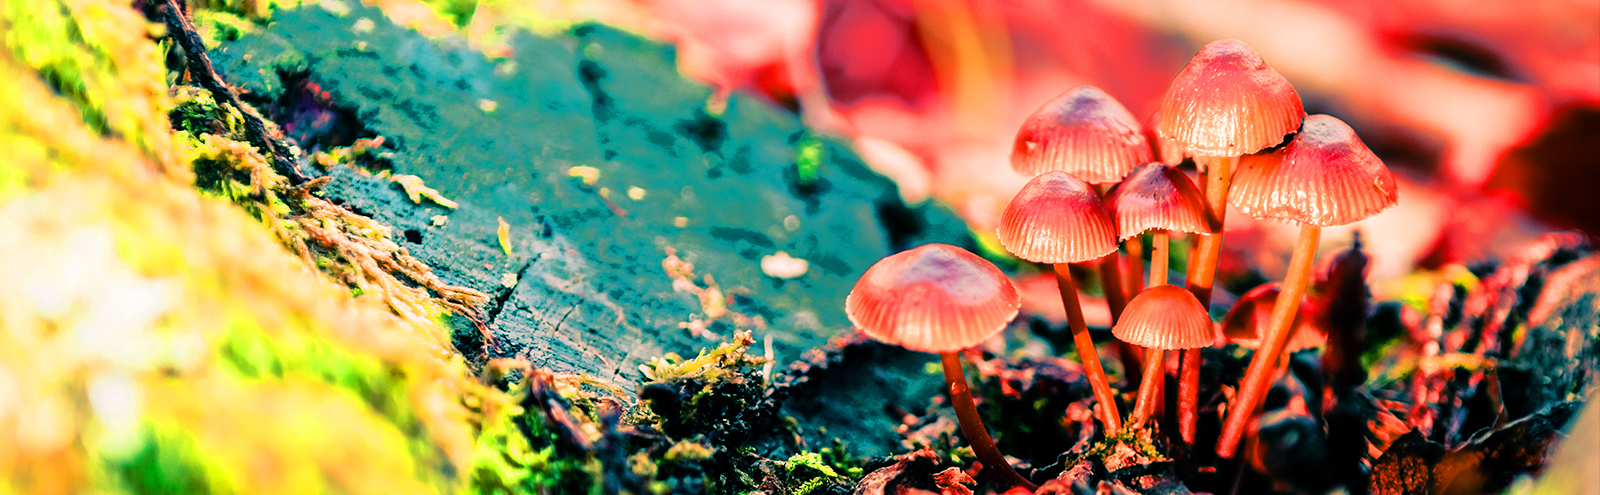 mushrooms-tfeat-uproxx.jpg